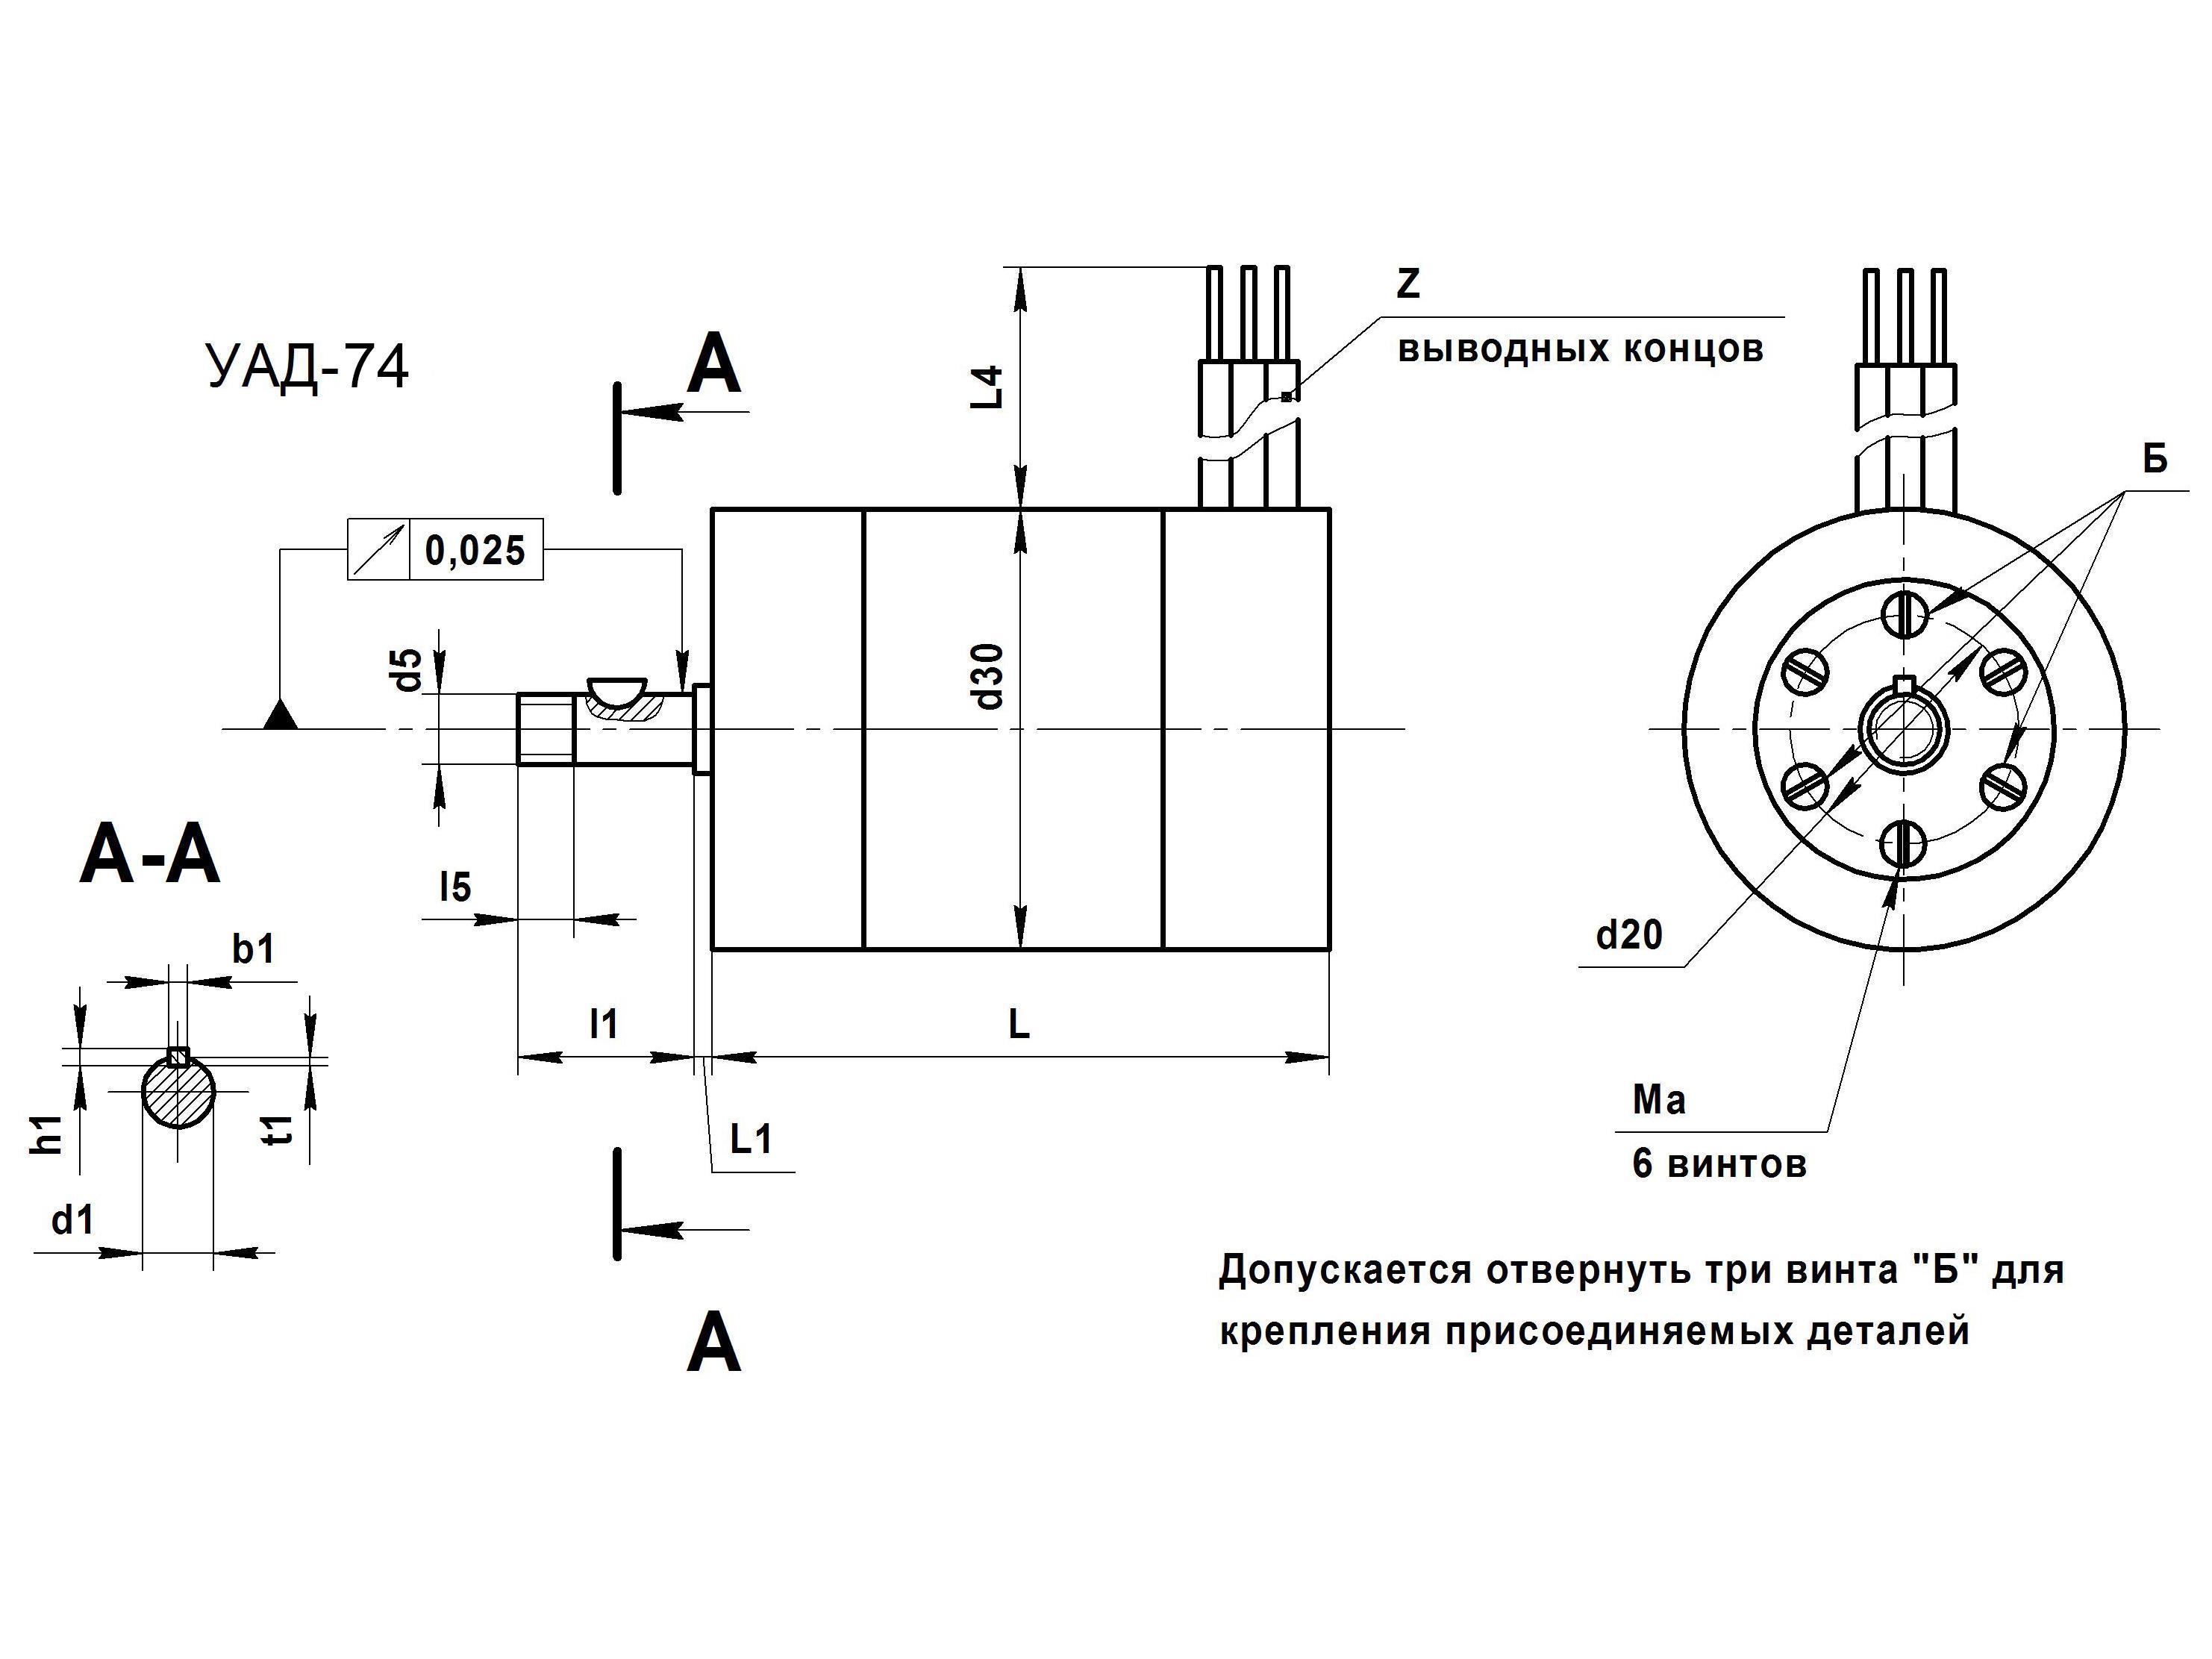 уад-32 схема включения 220 в